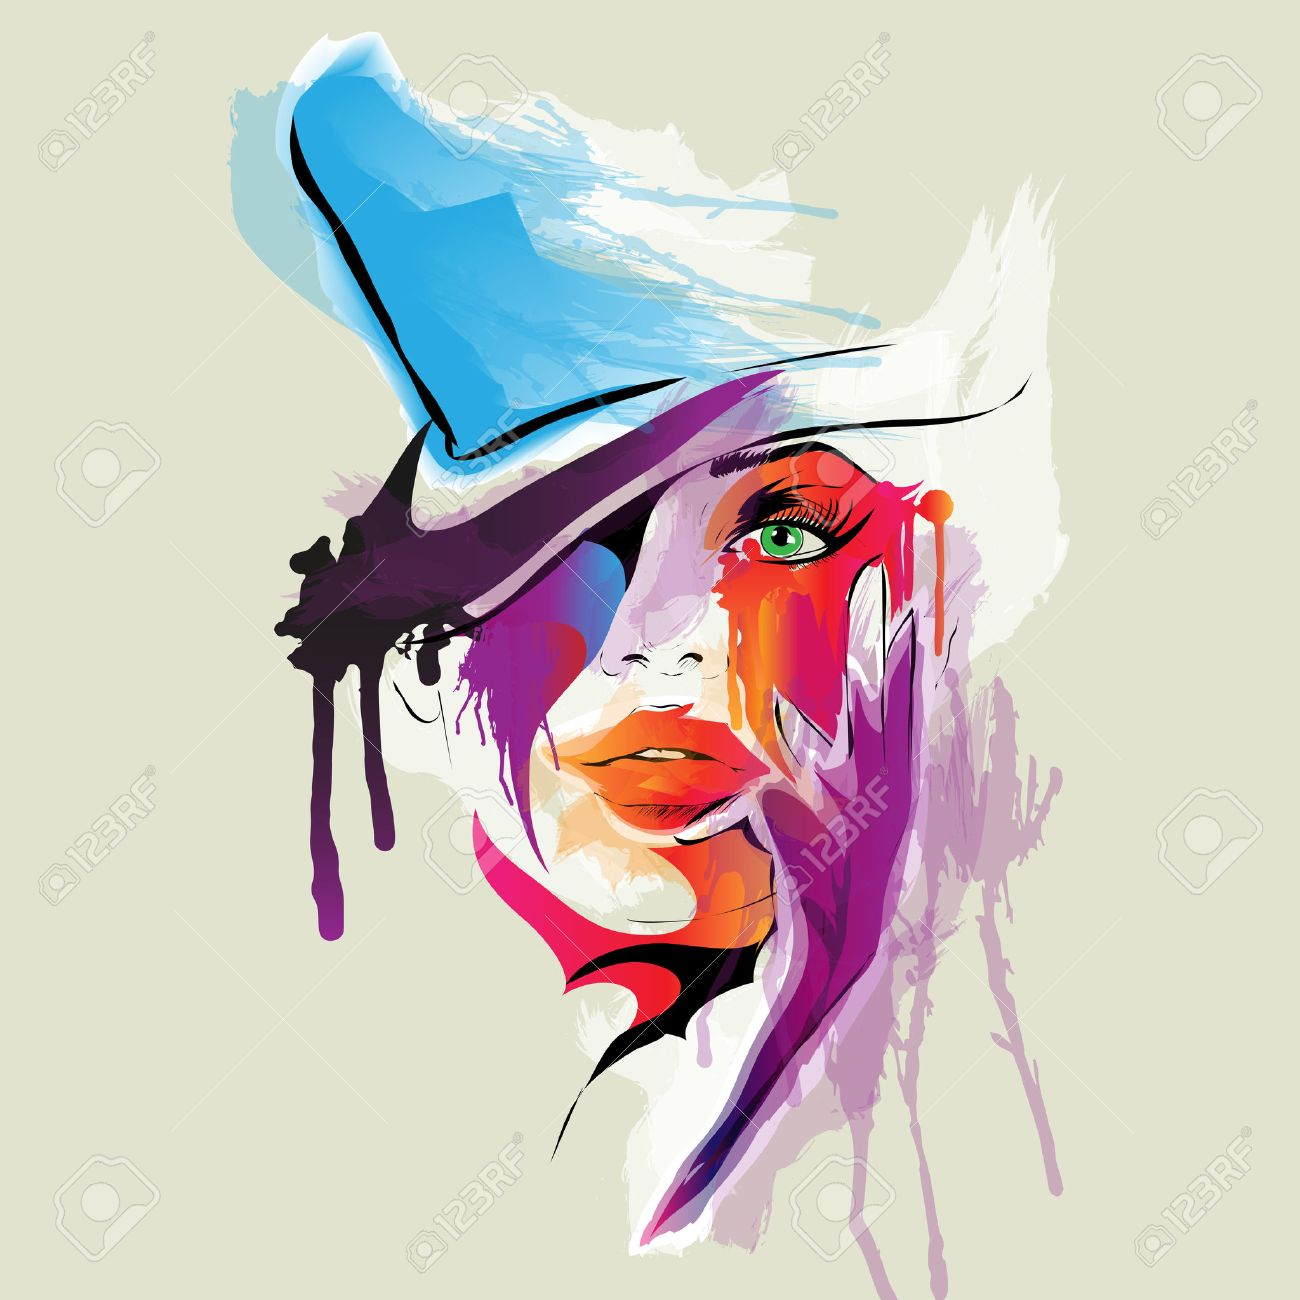 Abstract Woman Face Illustration Royalty Free Cliparts, Vectors ...